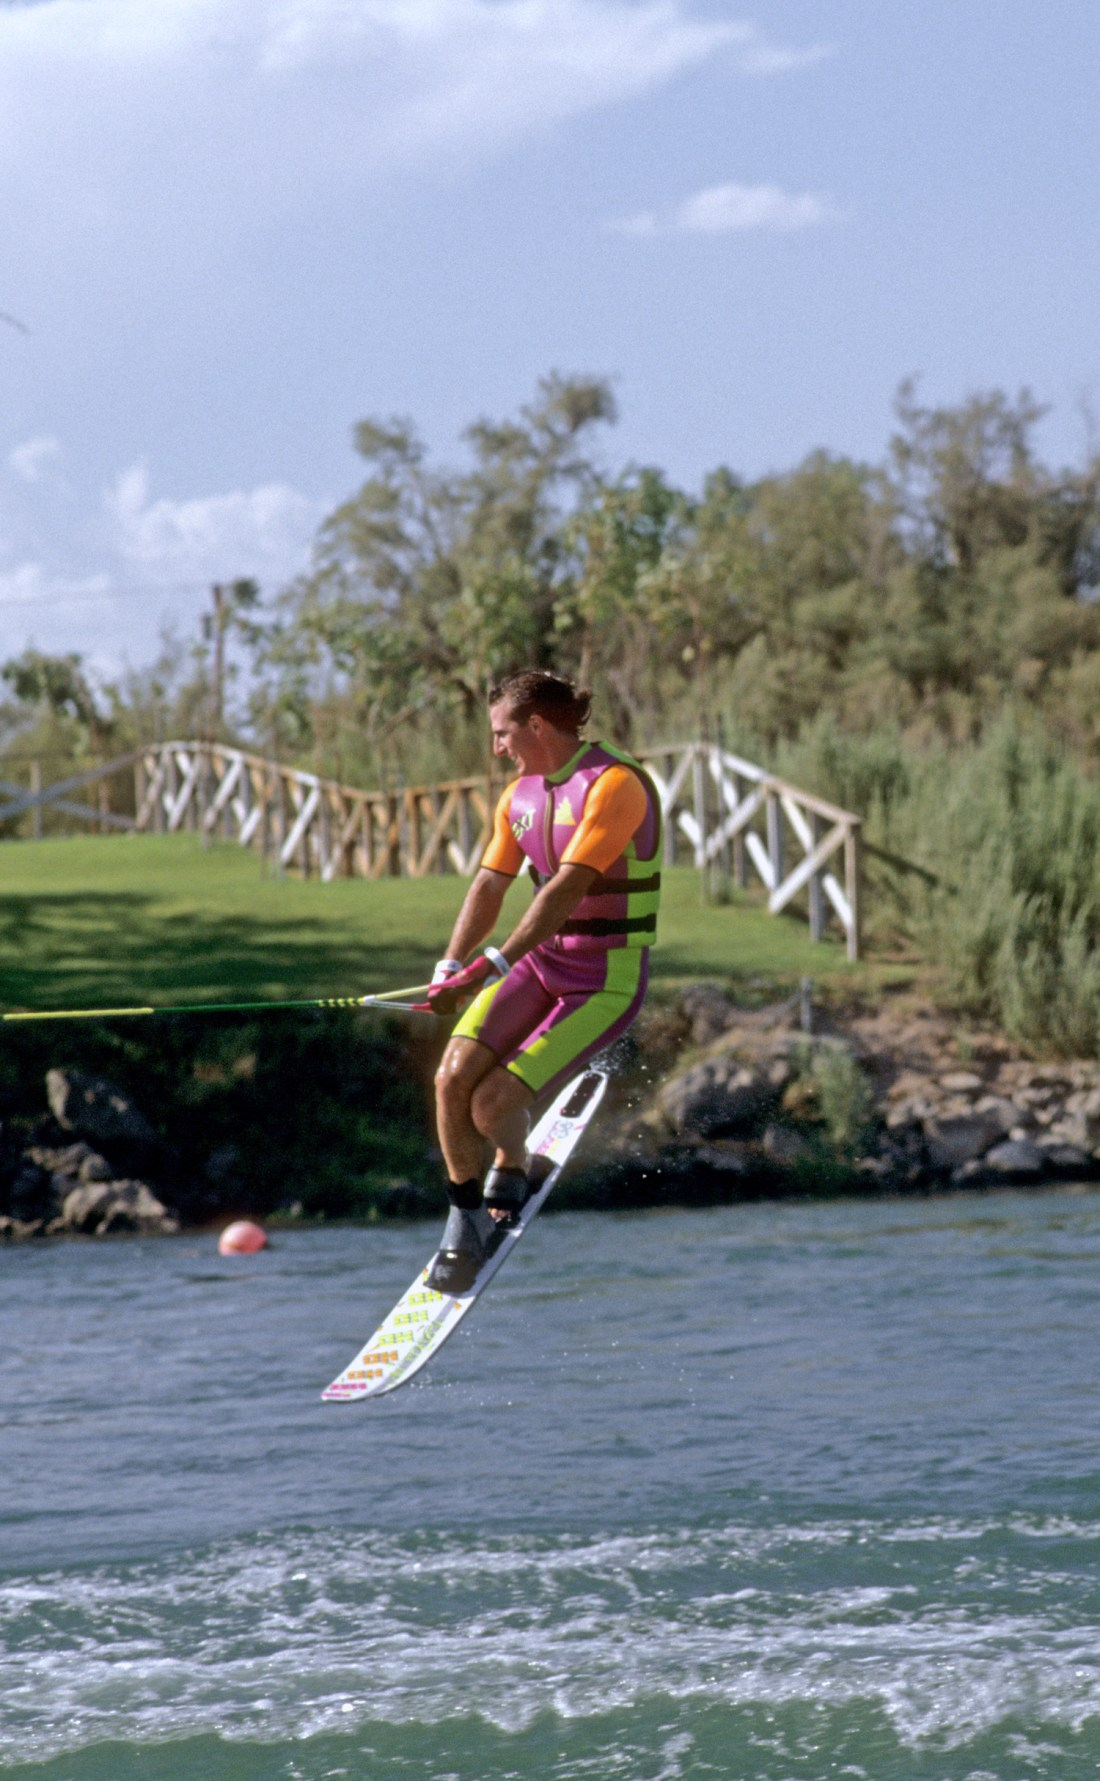 f_TonyKlarich.com_Water_Skiing_AERIALJUMPFENCE_HotDog_Creative_Commons_Free_3MR